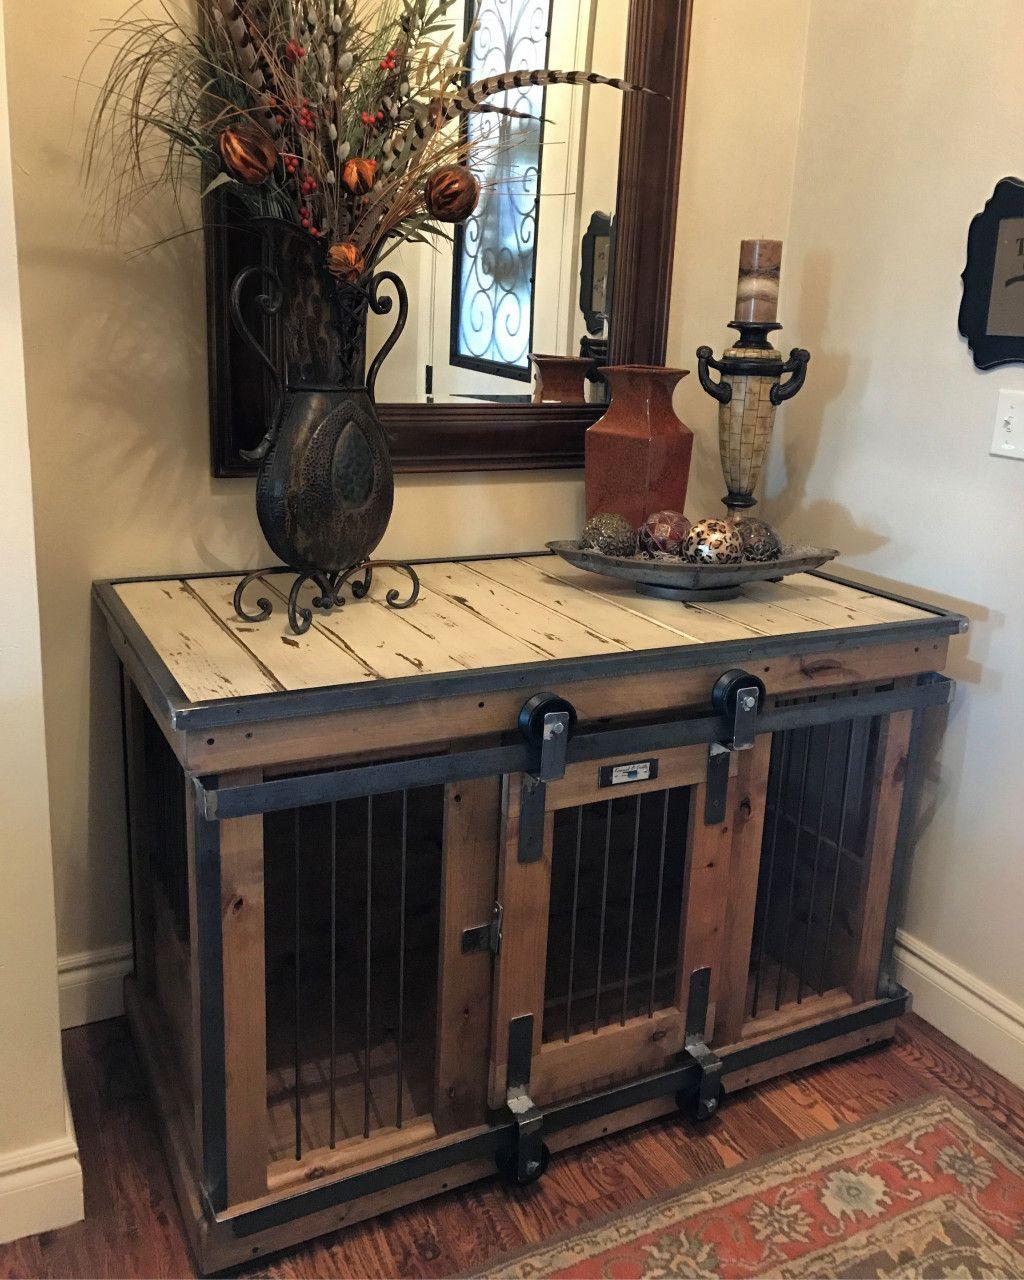 28 Beautiful Coffee Table Dog Crate 2019 Dog Crate Furniture